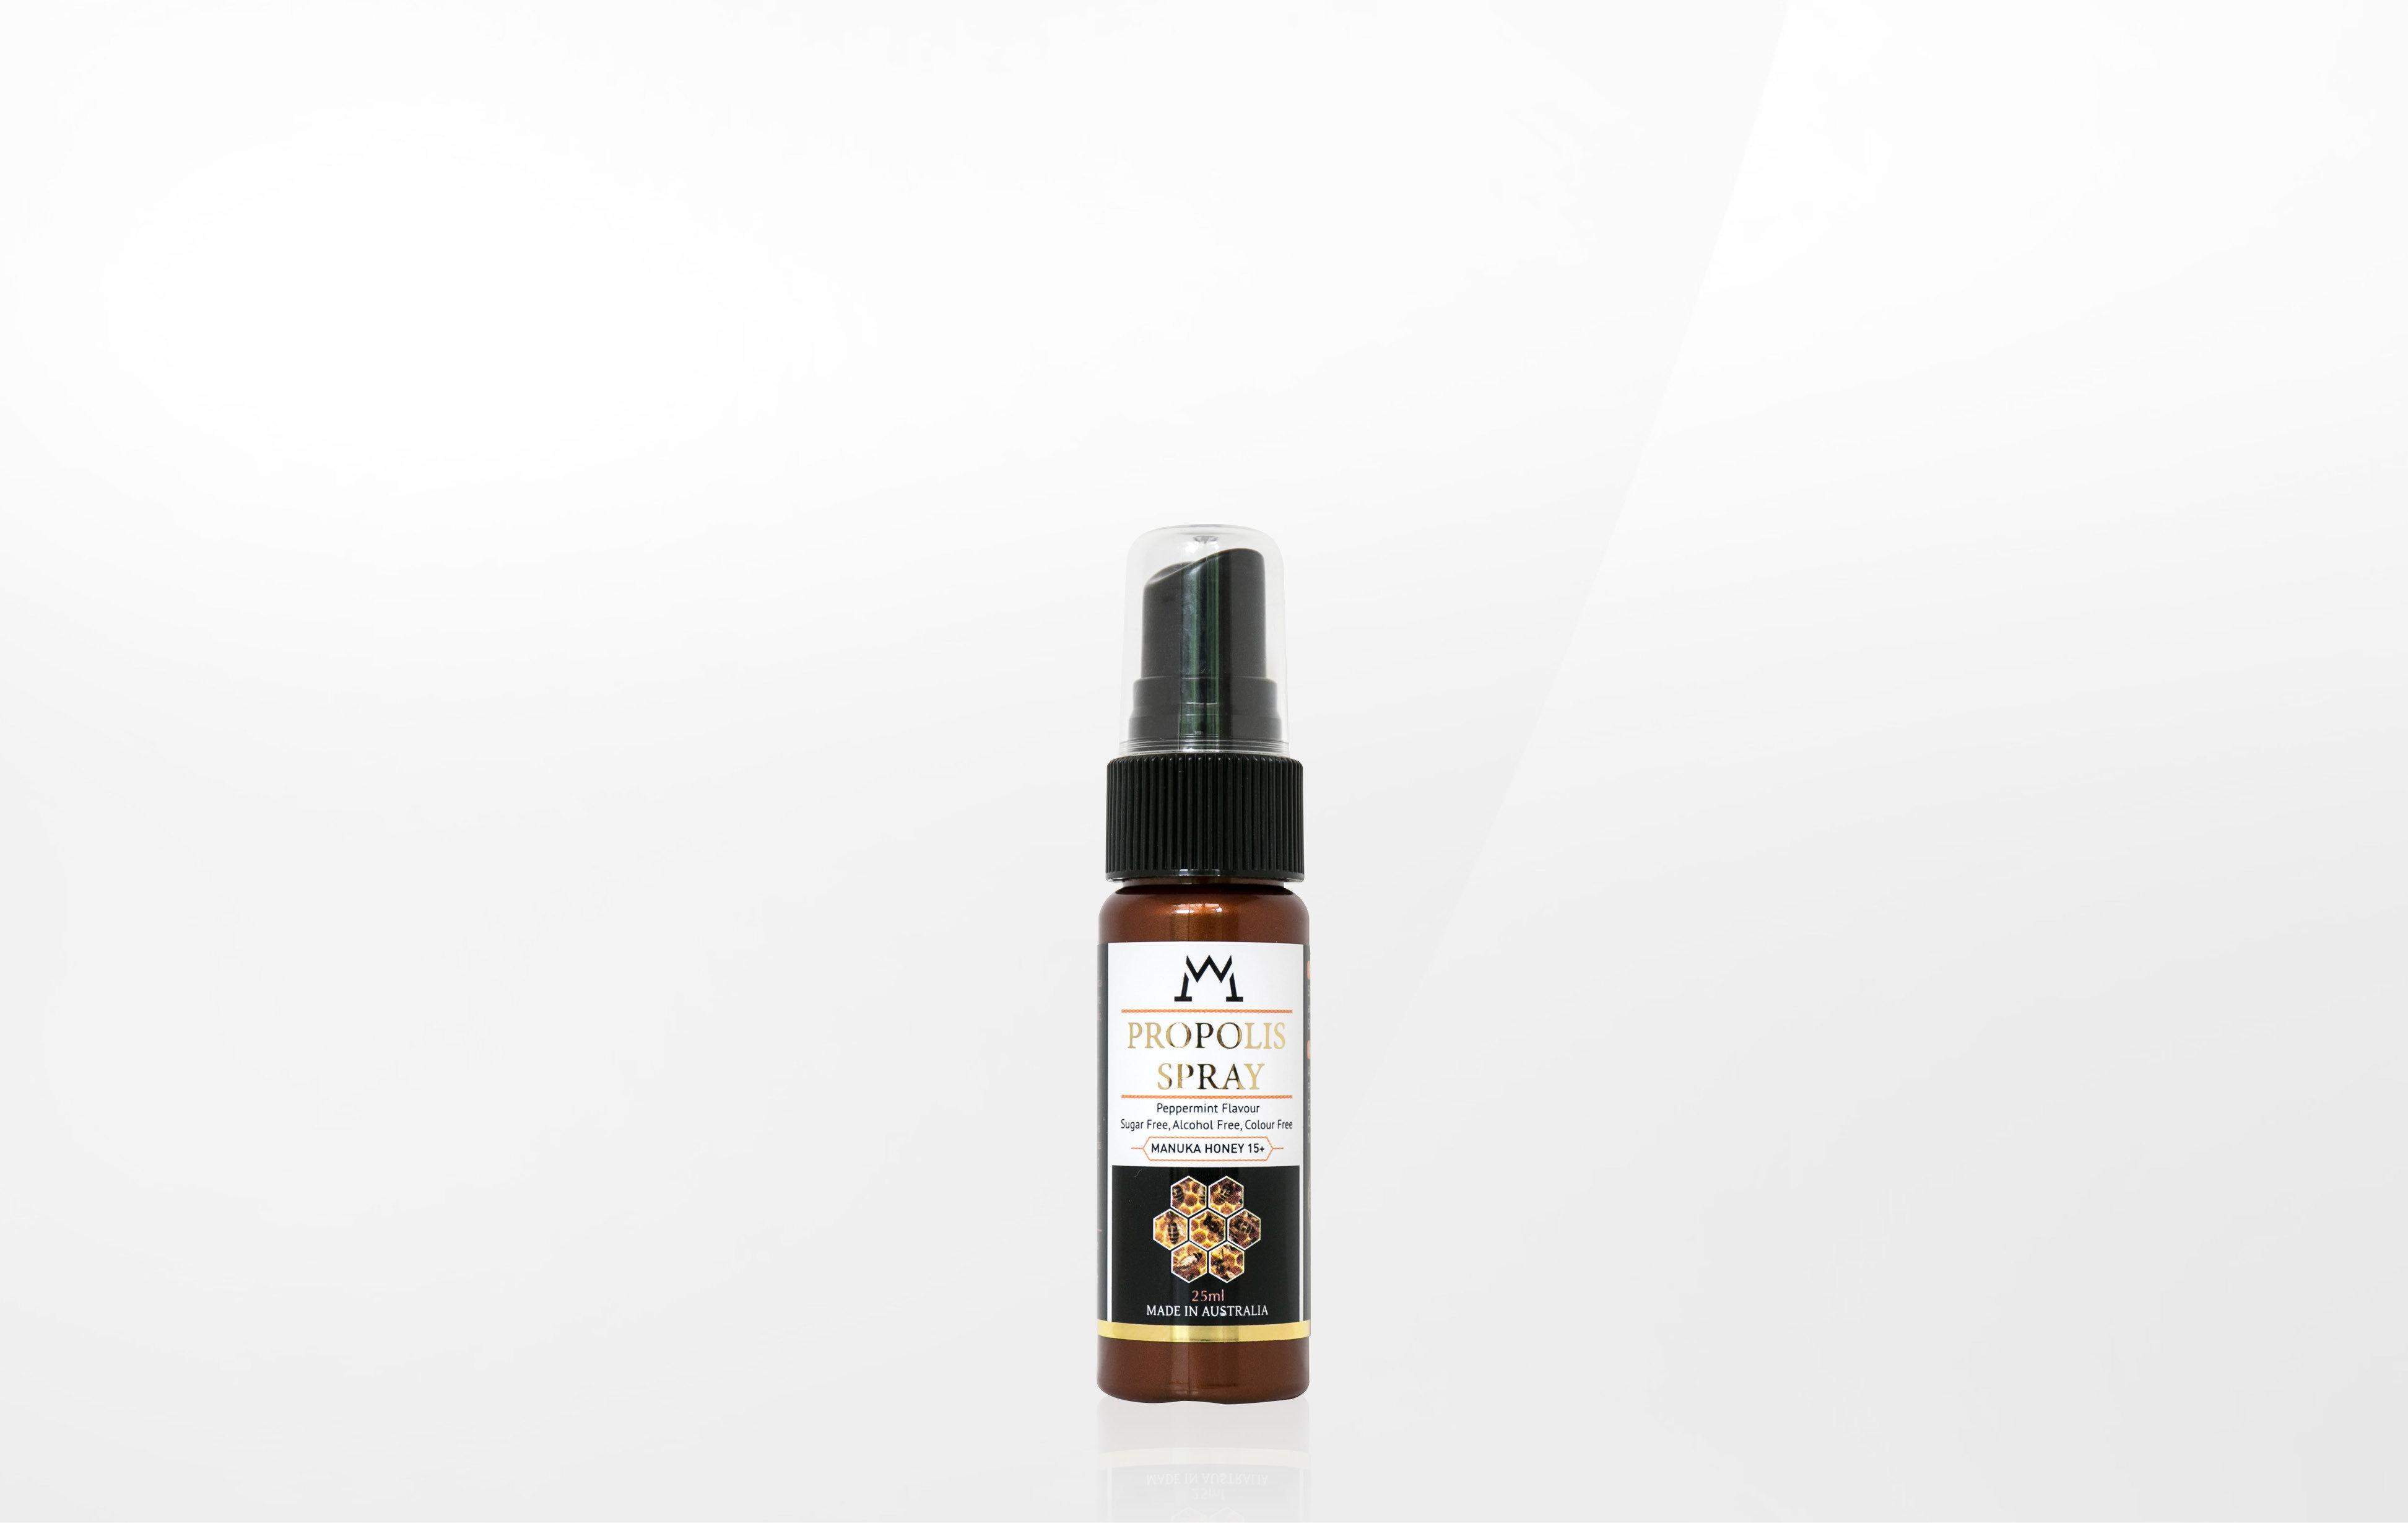 Propolis and Manuka honey 15 throat spray 006